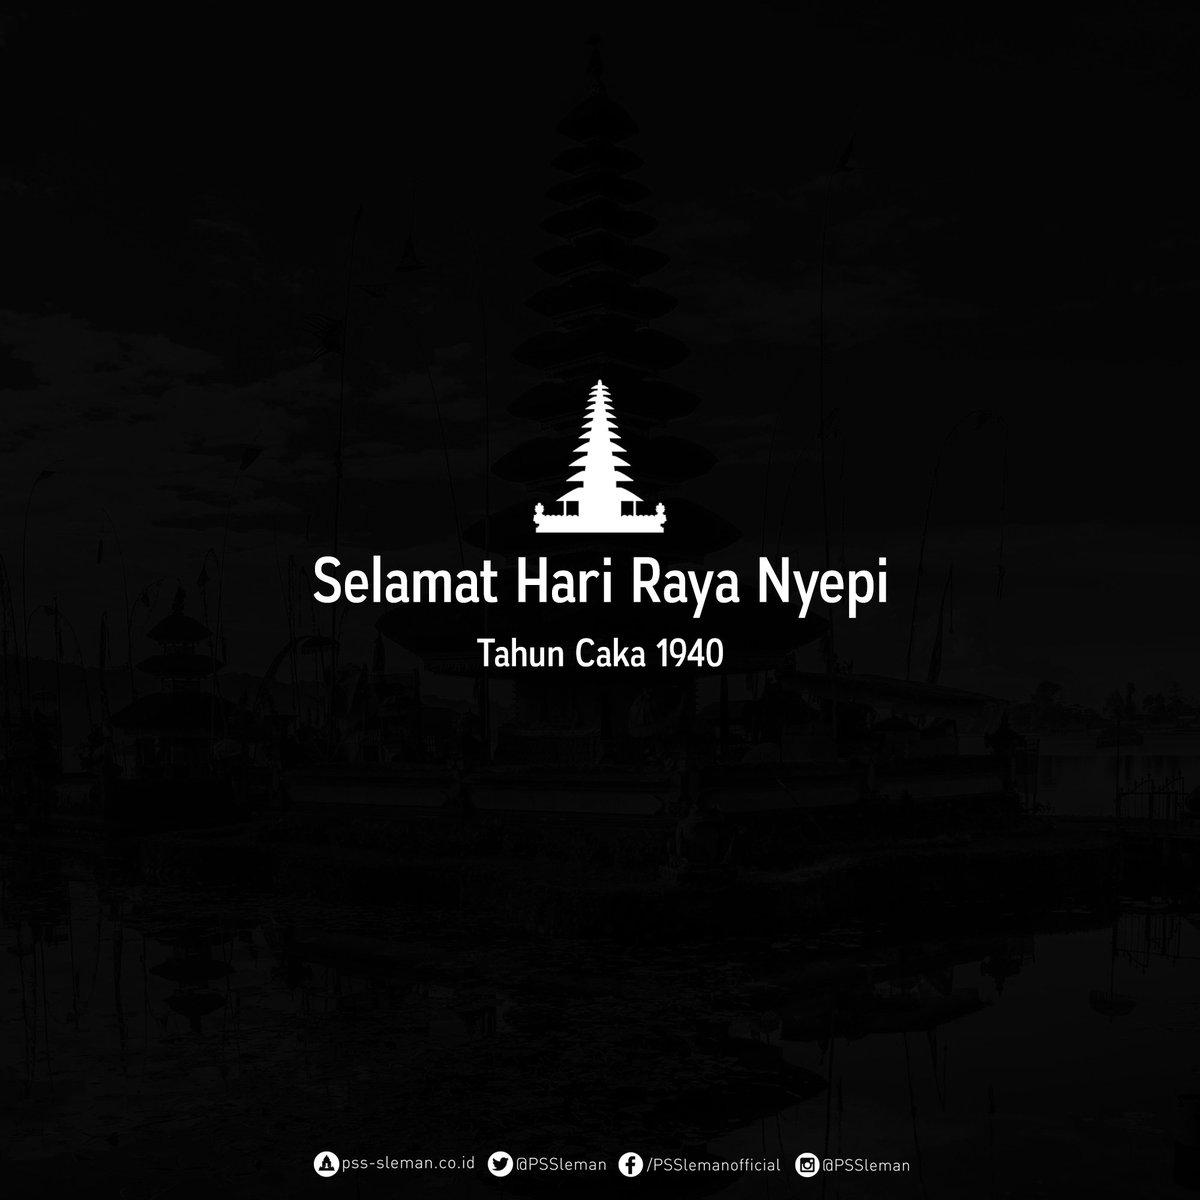 Selamat Hari Raya Nyepi 2018 bagi yang m...